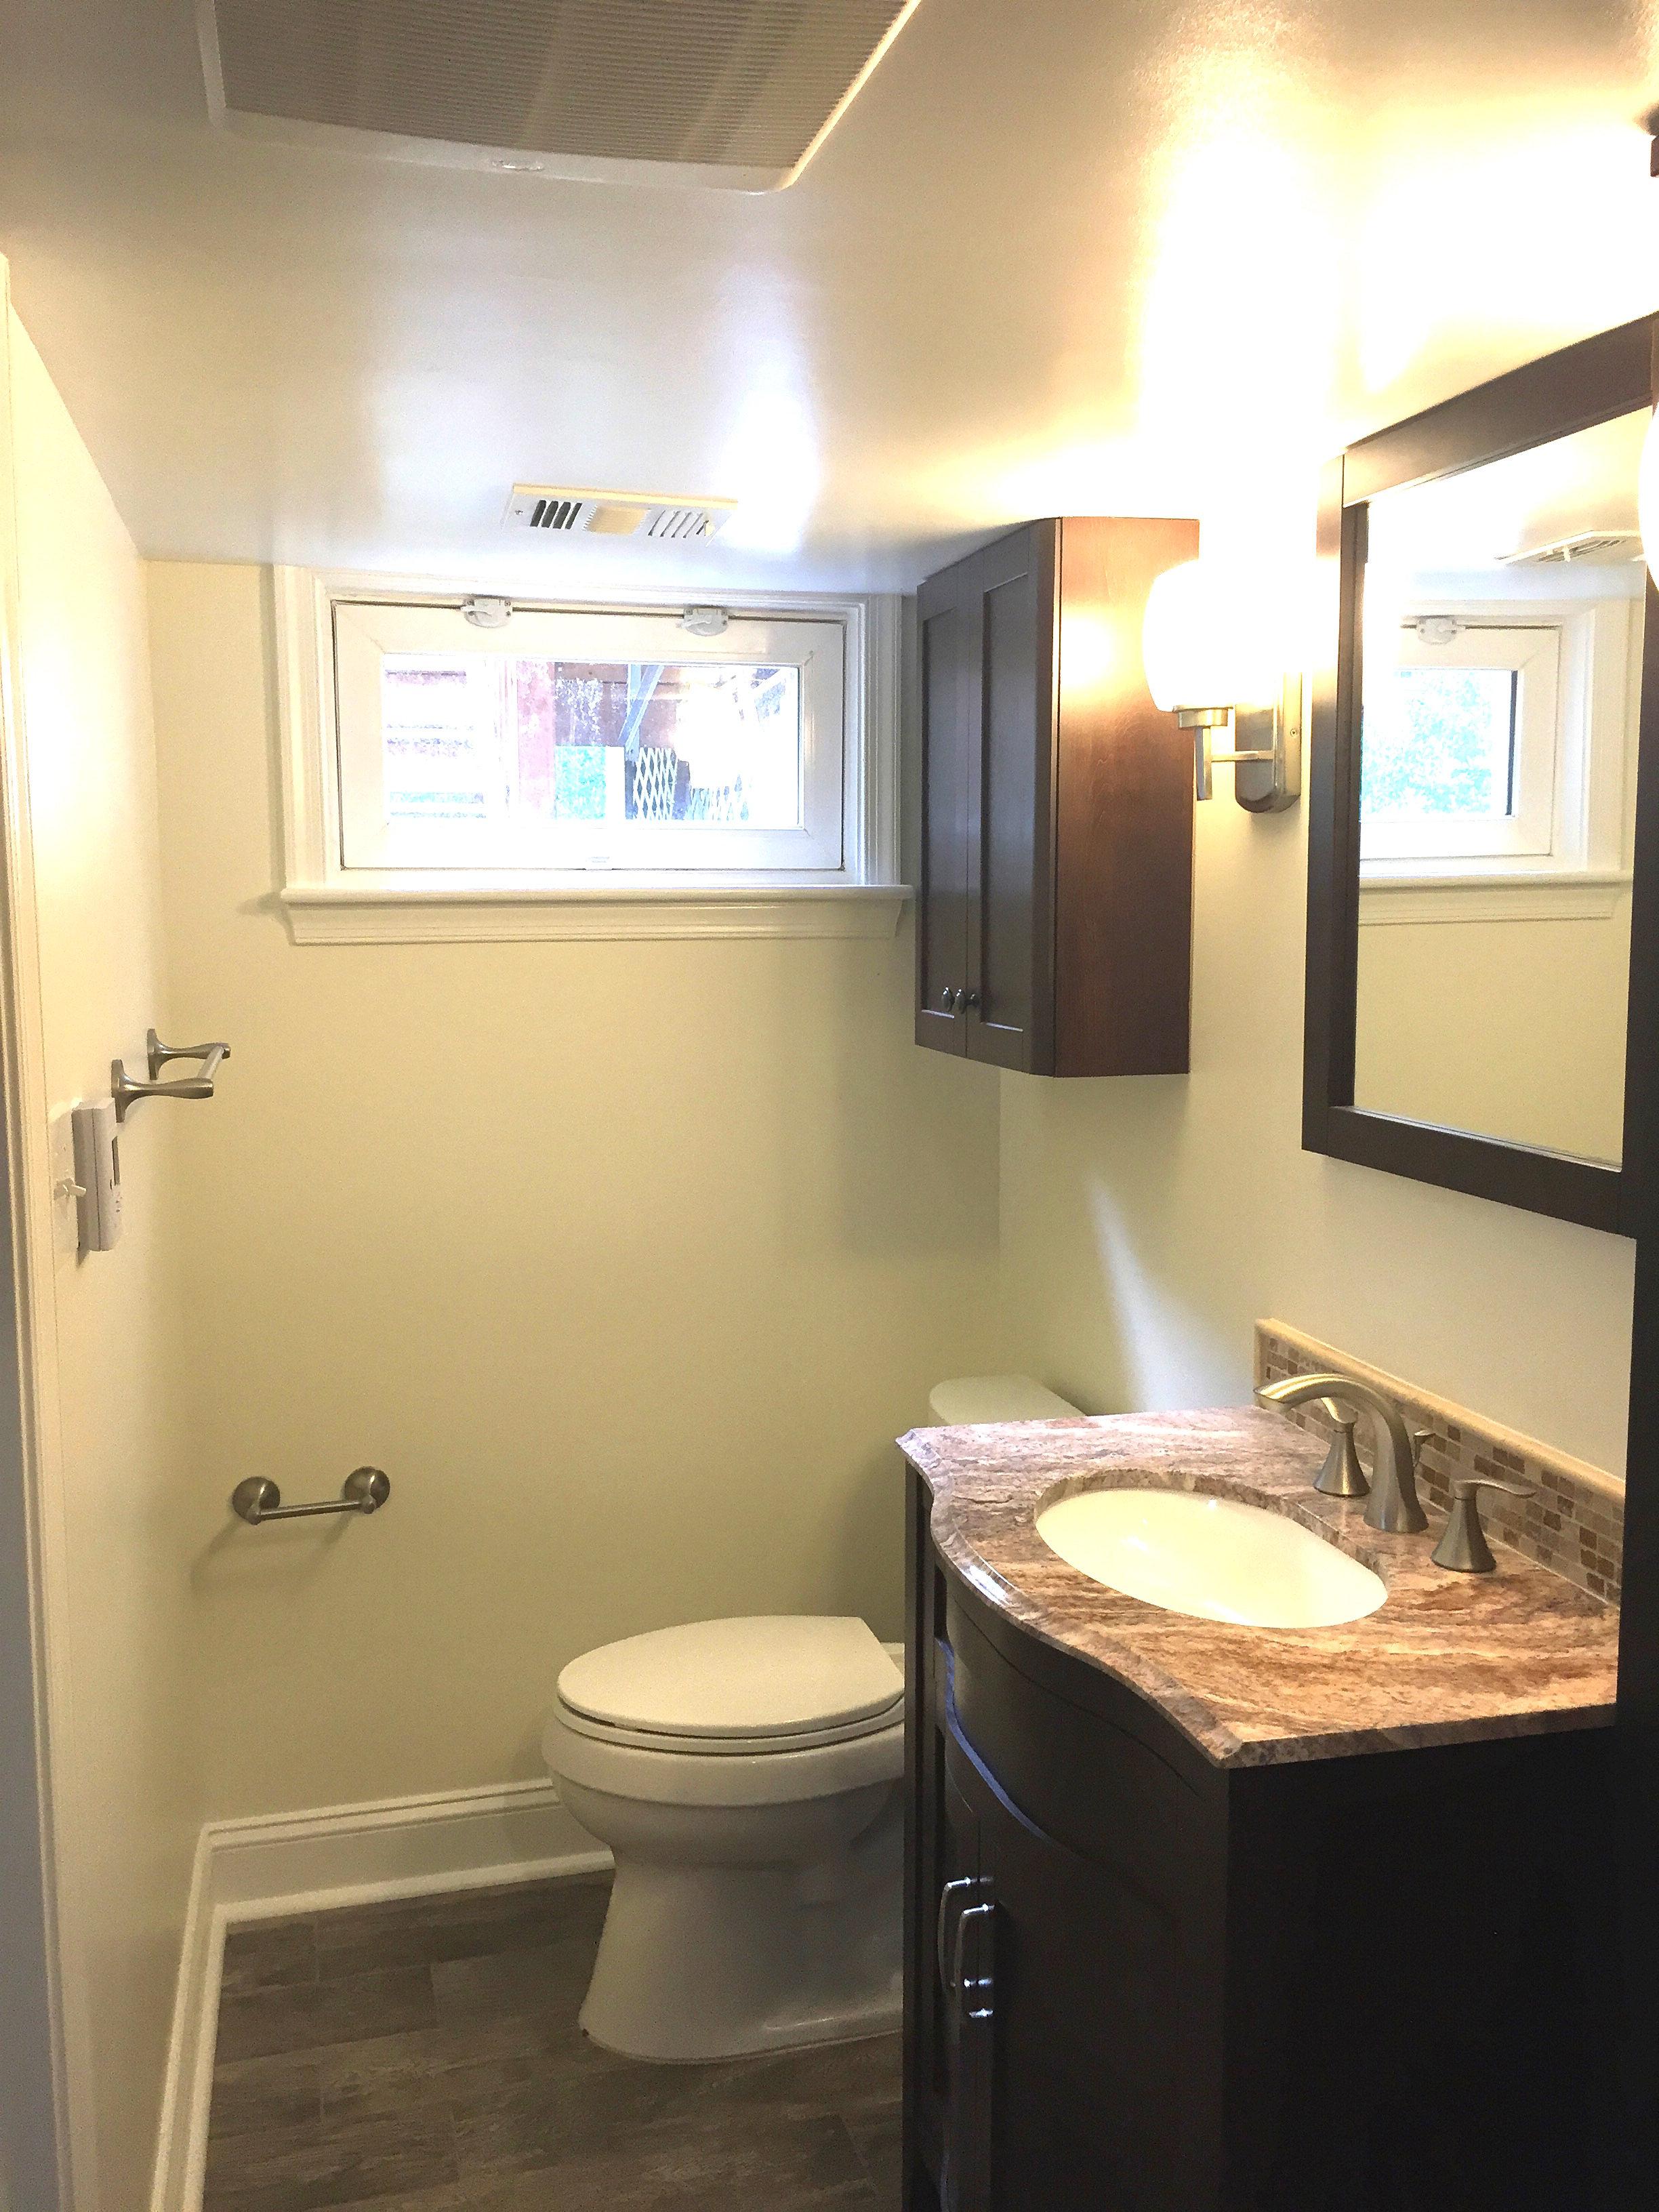 Stunning Karma Home Designs Ideas - Amazing Design Ideas - luxsee.us